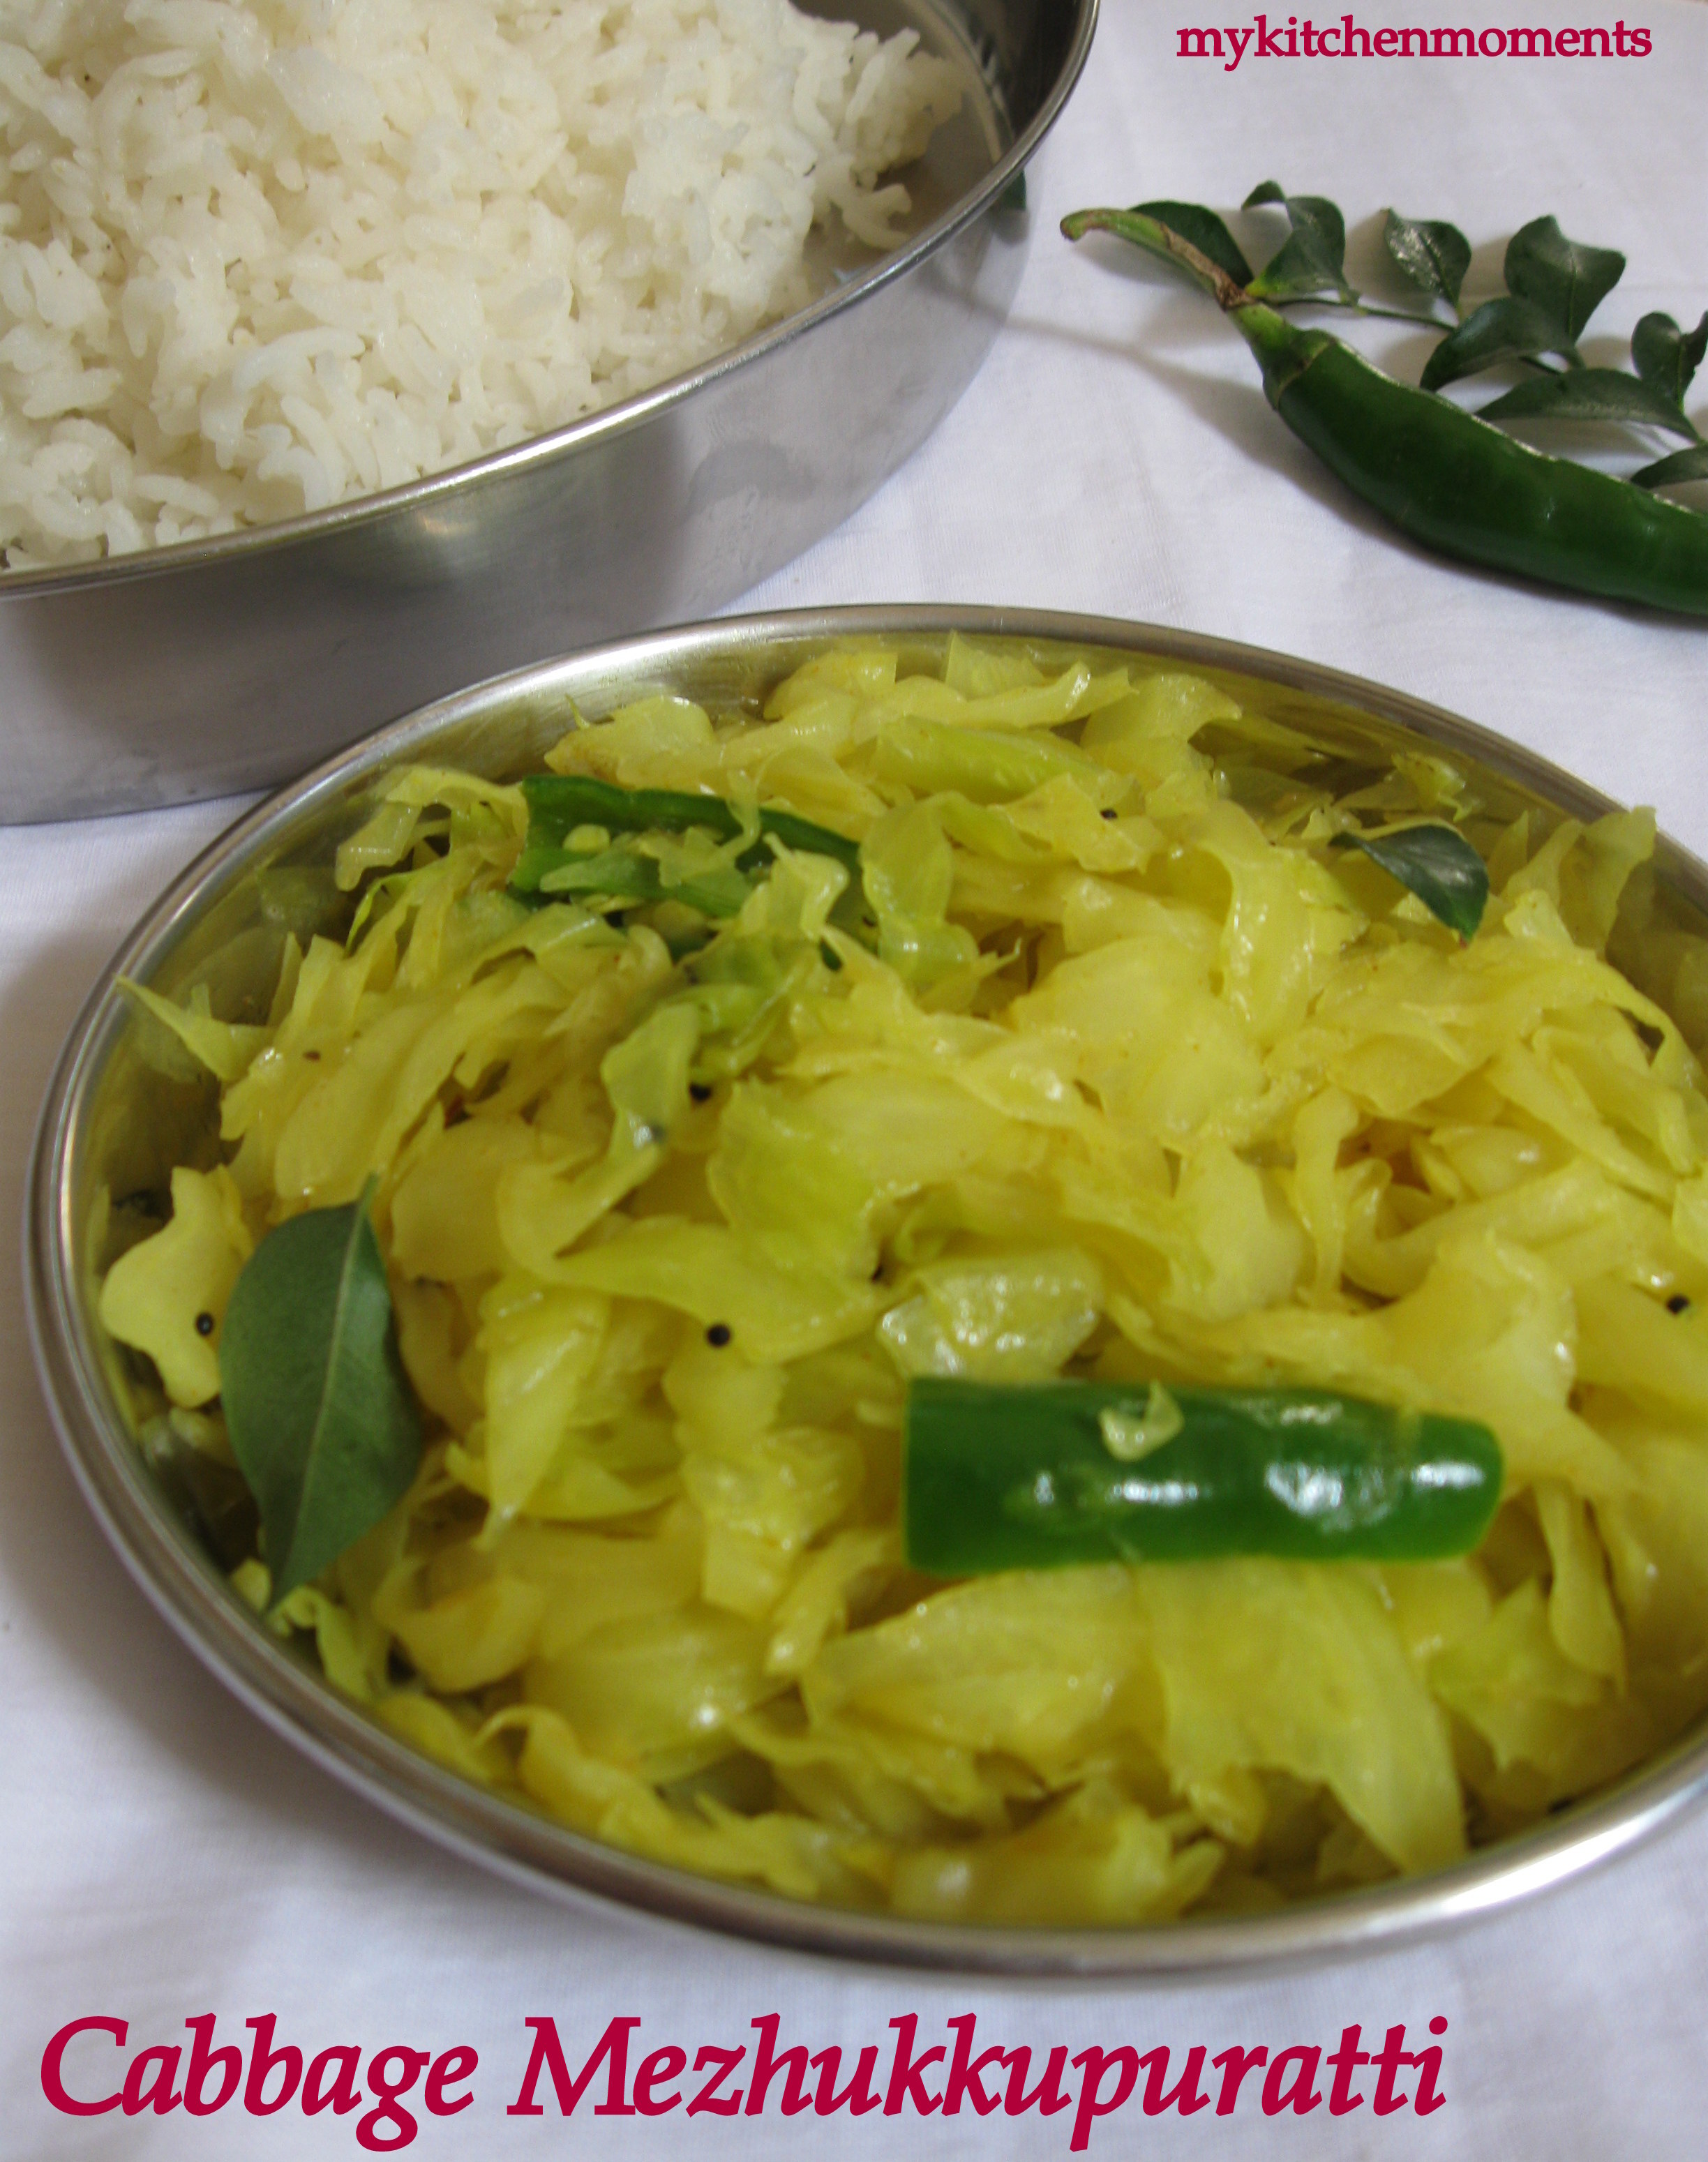 Cabbage Mezhukkupuratti